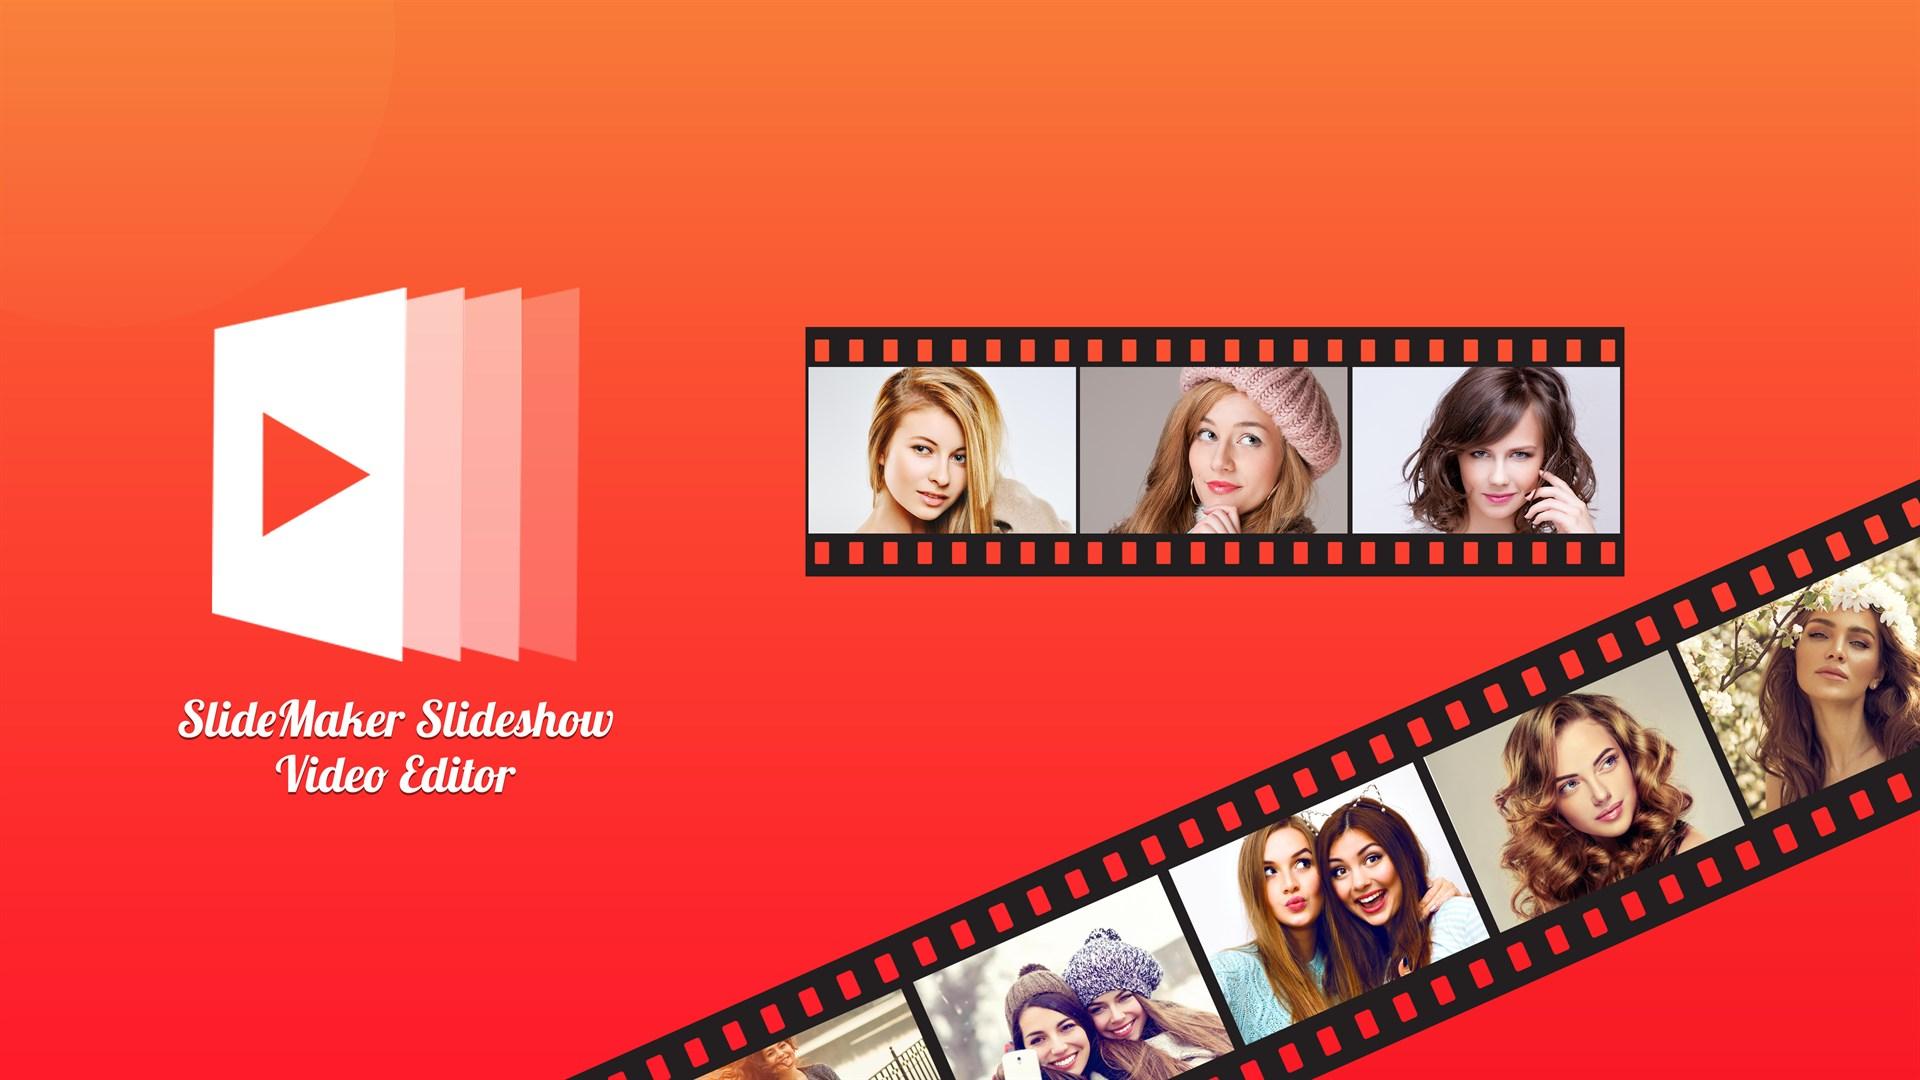 SlideMaker Slideshow Video Editor GRATIS